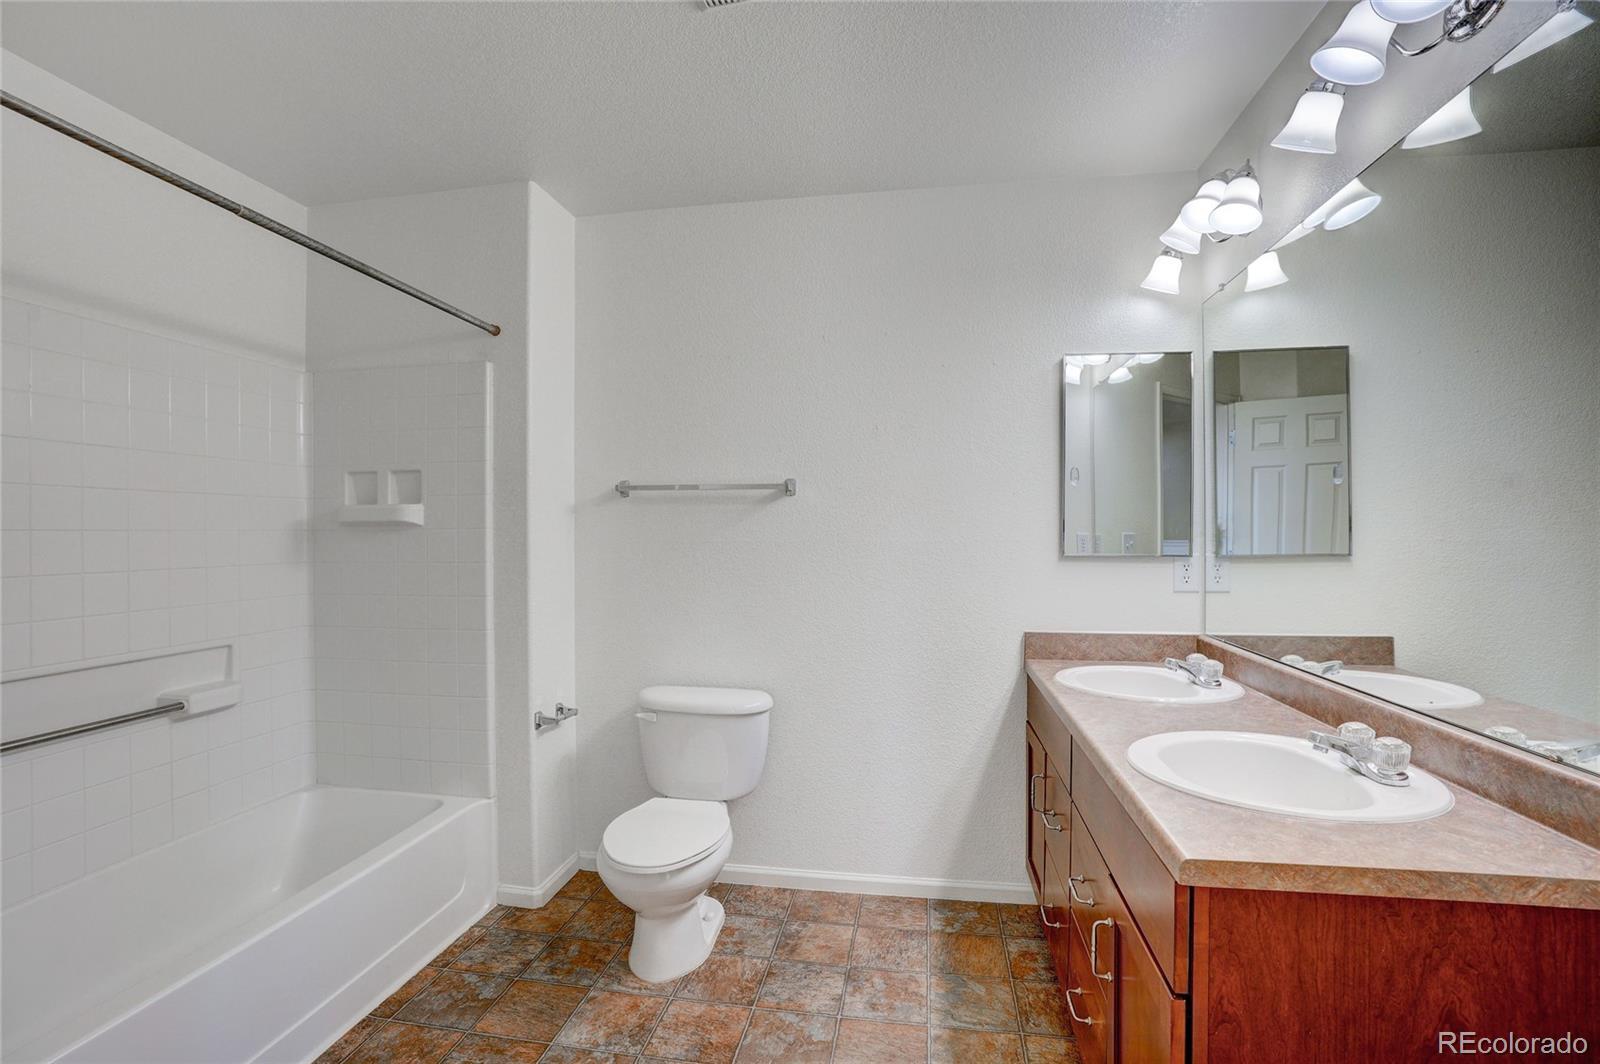 Upper Bathroom with Double Sinks